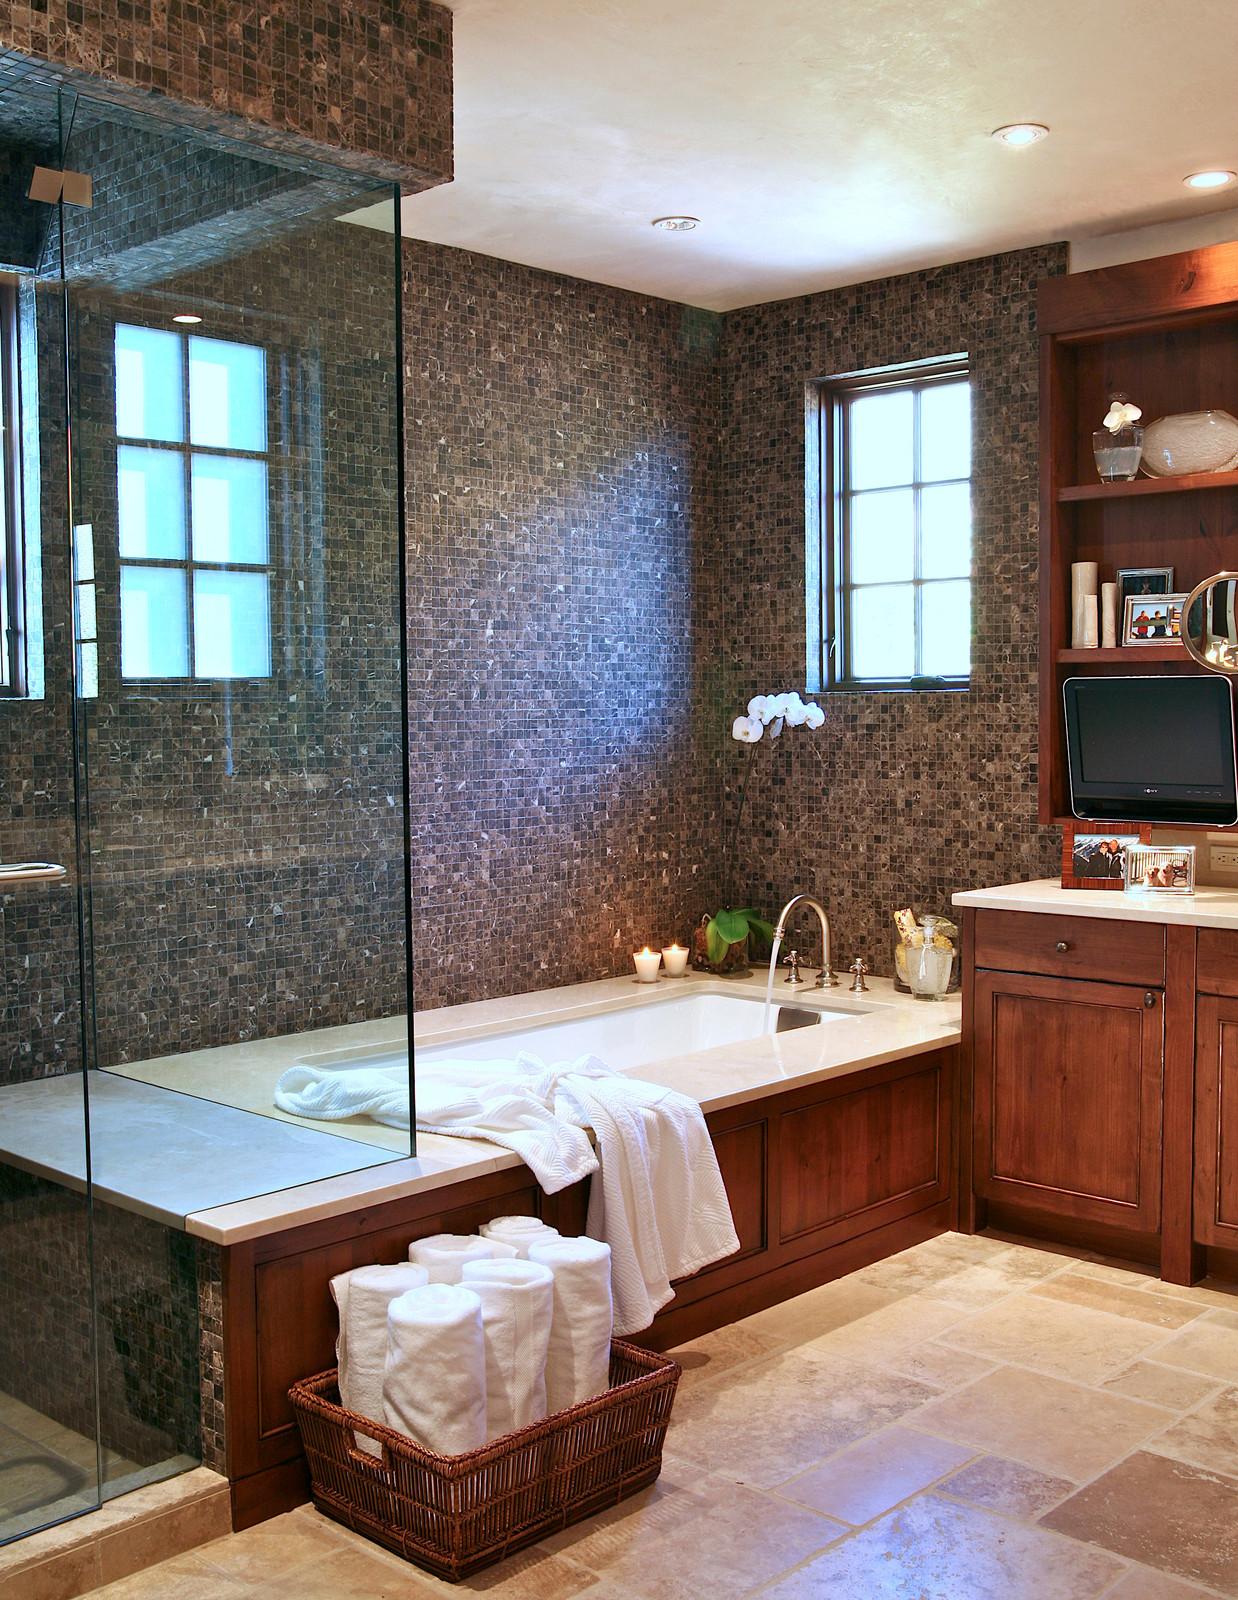 16 Fantastic Rustic Bathroom Designs That Will Take Your ... on Restroom Ideas  id=38108